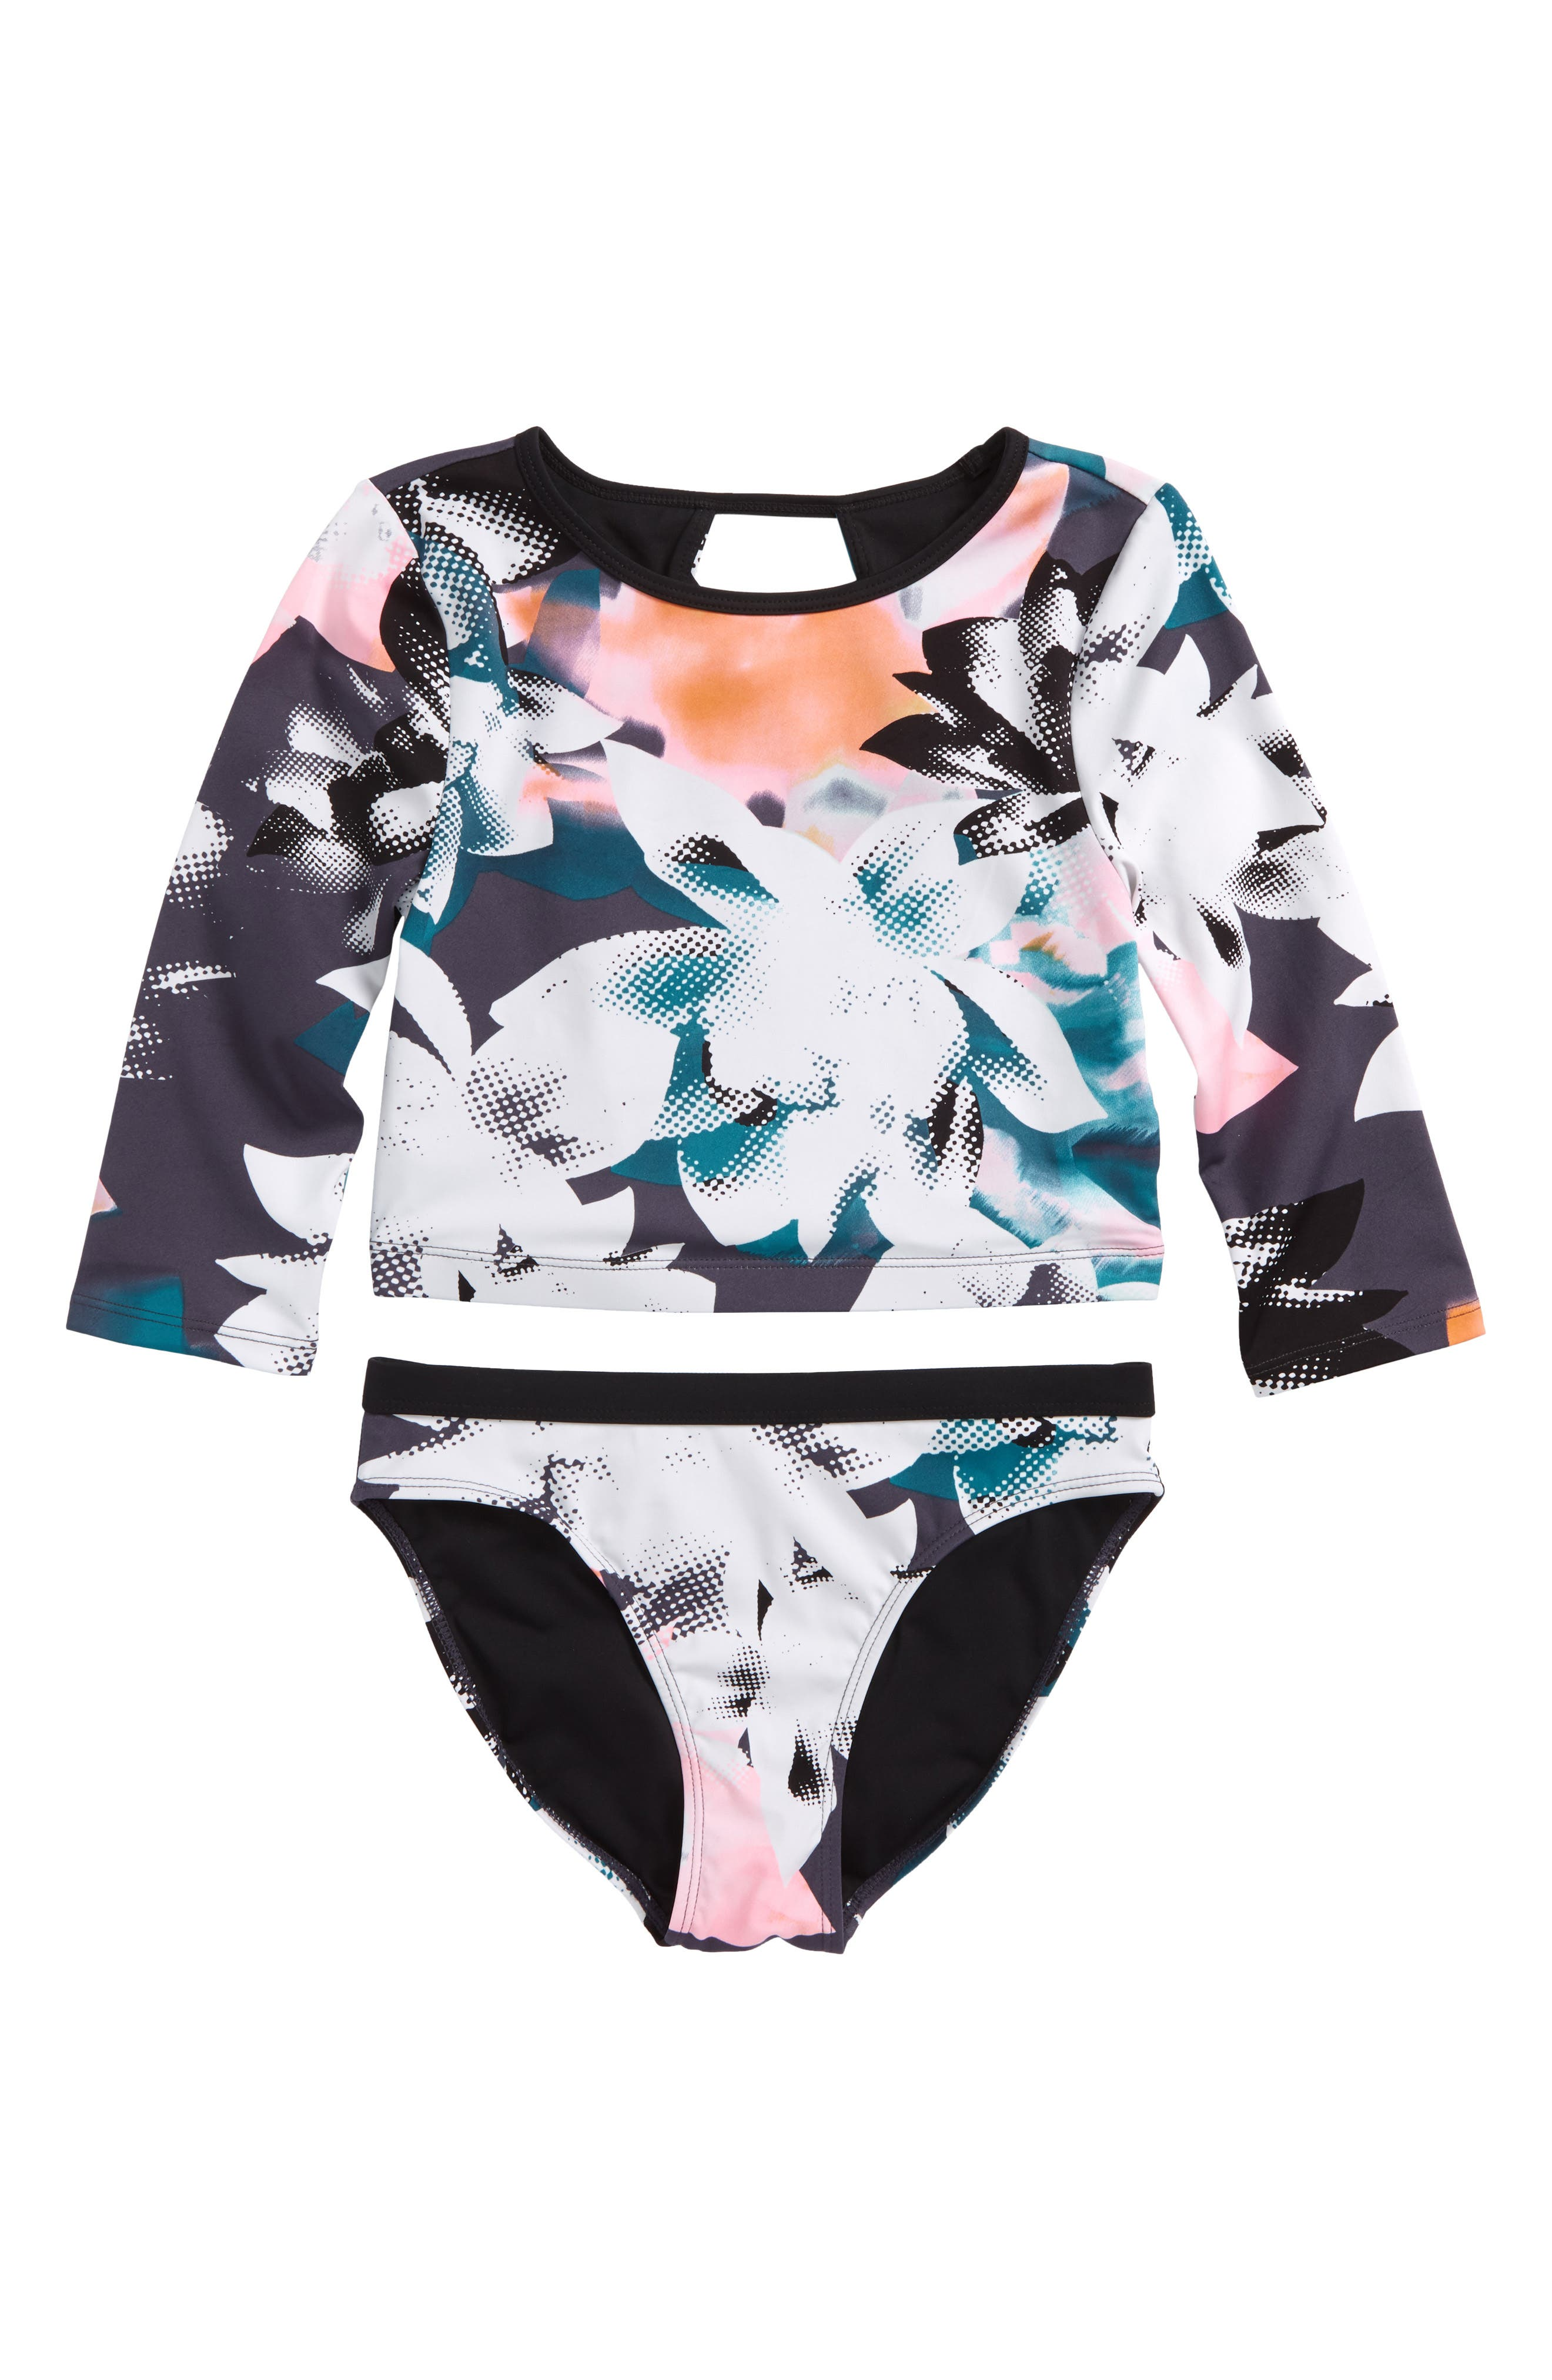 Scoop Two-Piece Rashguard Swimsuit,                         Main,                         color, Black Halftone Floral